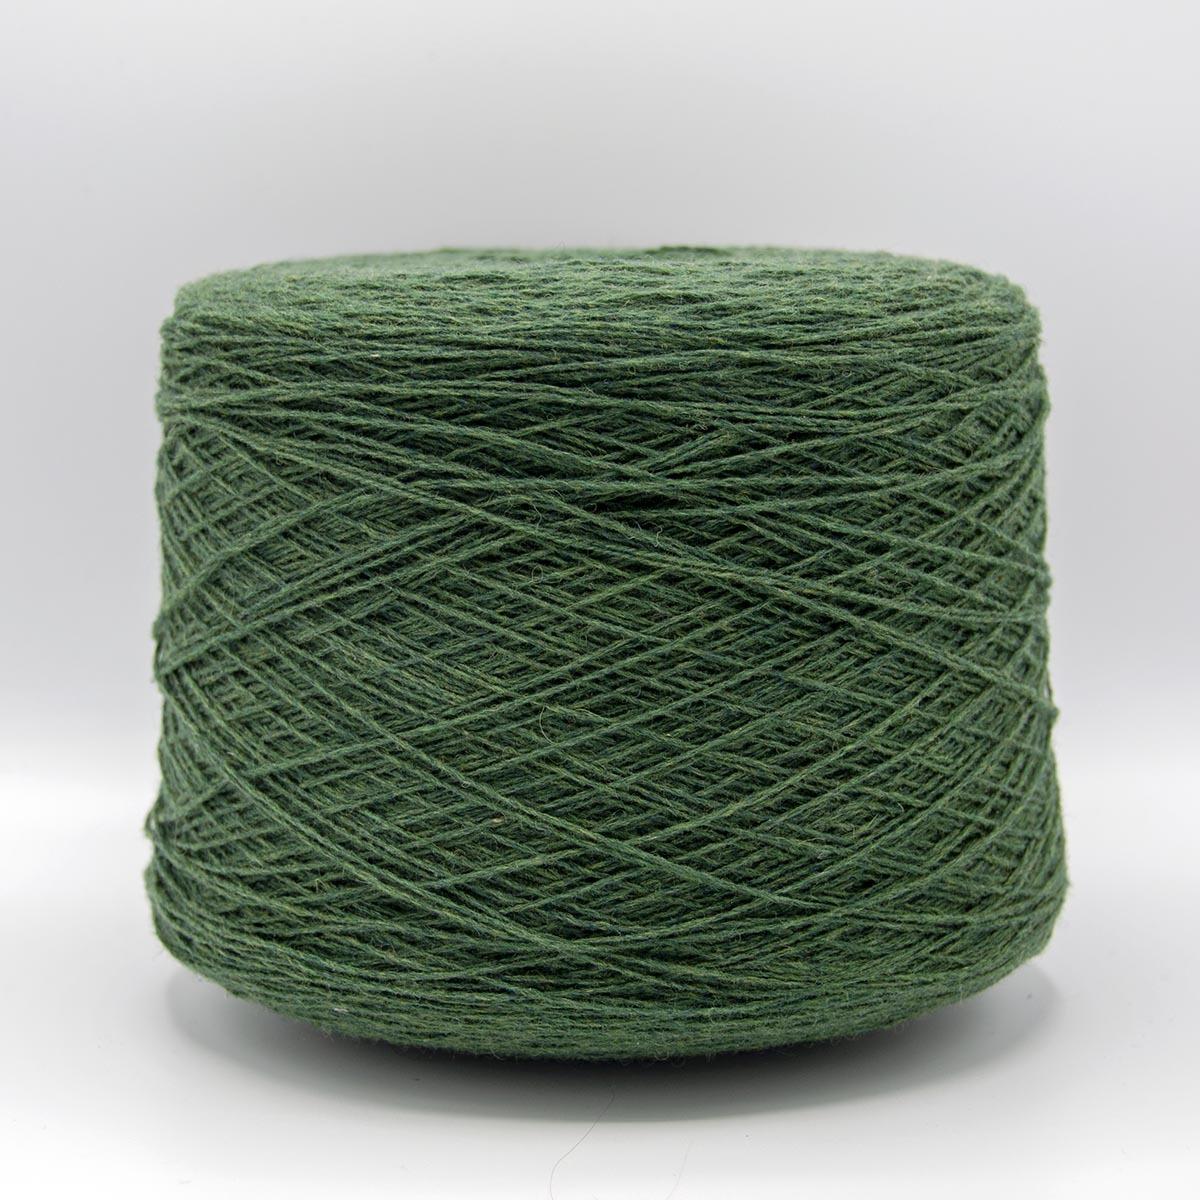 Knoll Yarns Merino Lambswool - 169